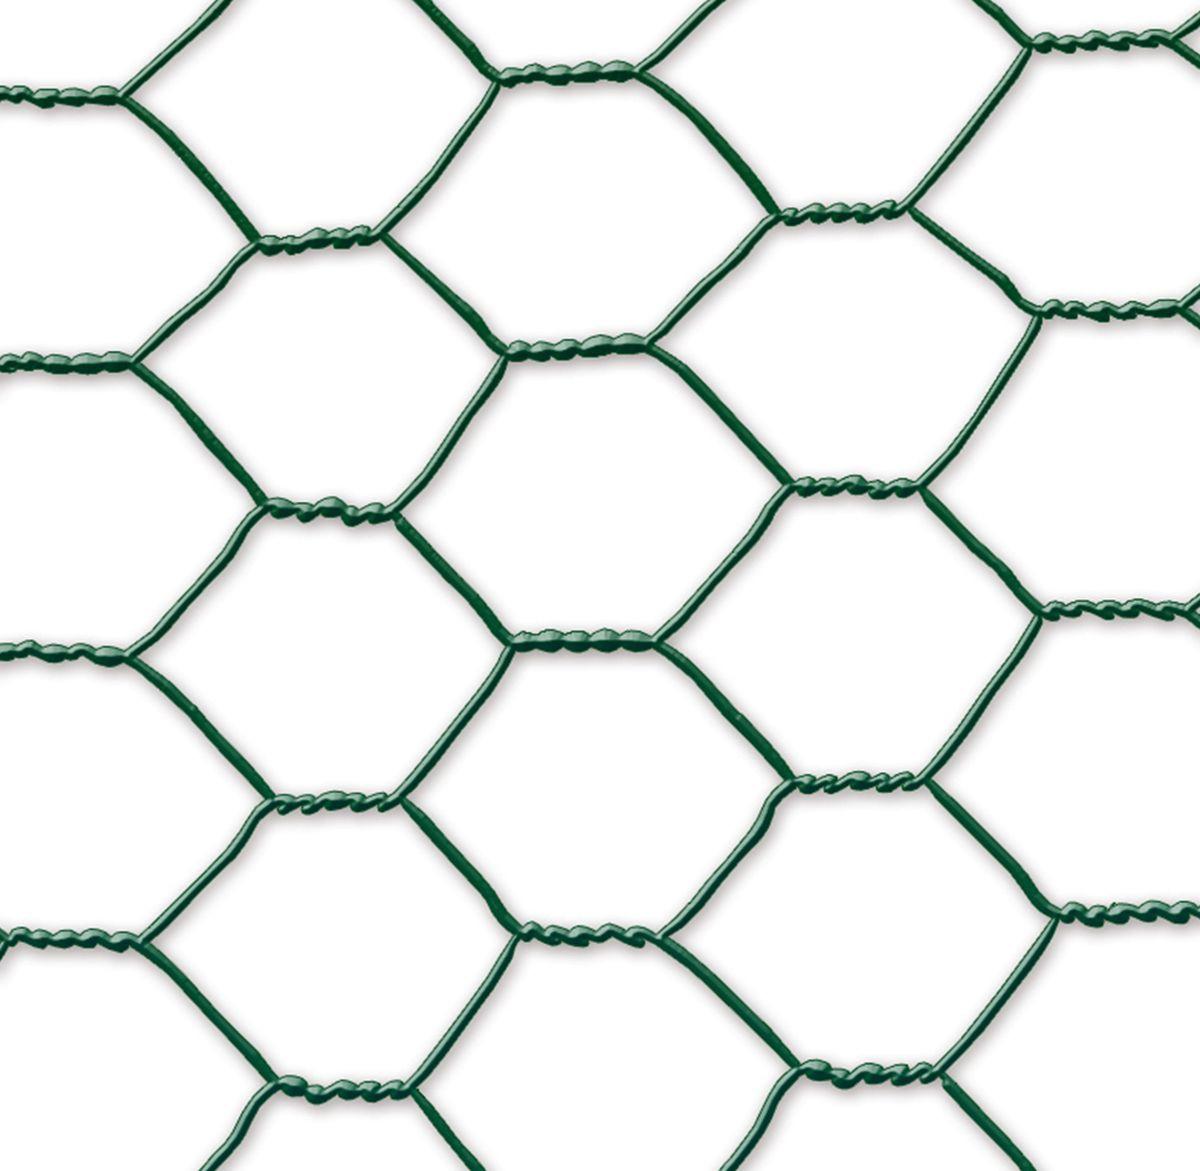 Grillage métal plastifié - 1 x 10 m/19 x 0,7 mm \